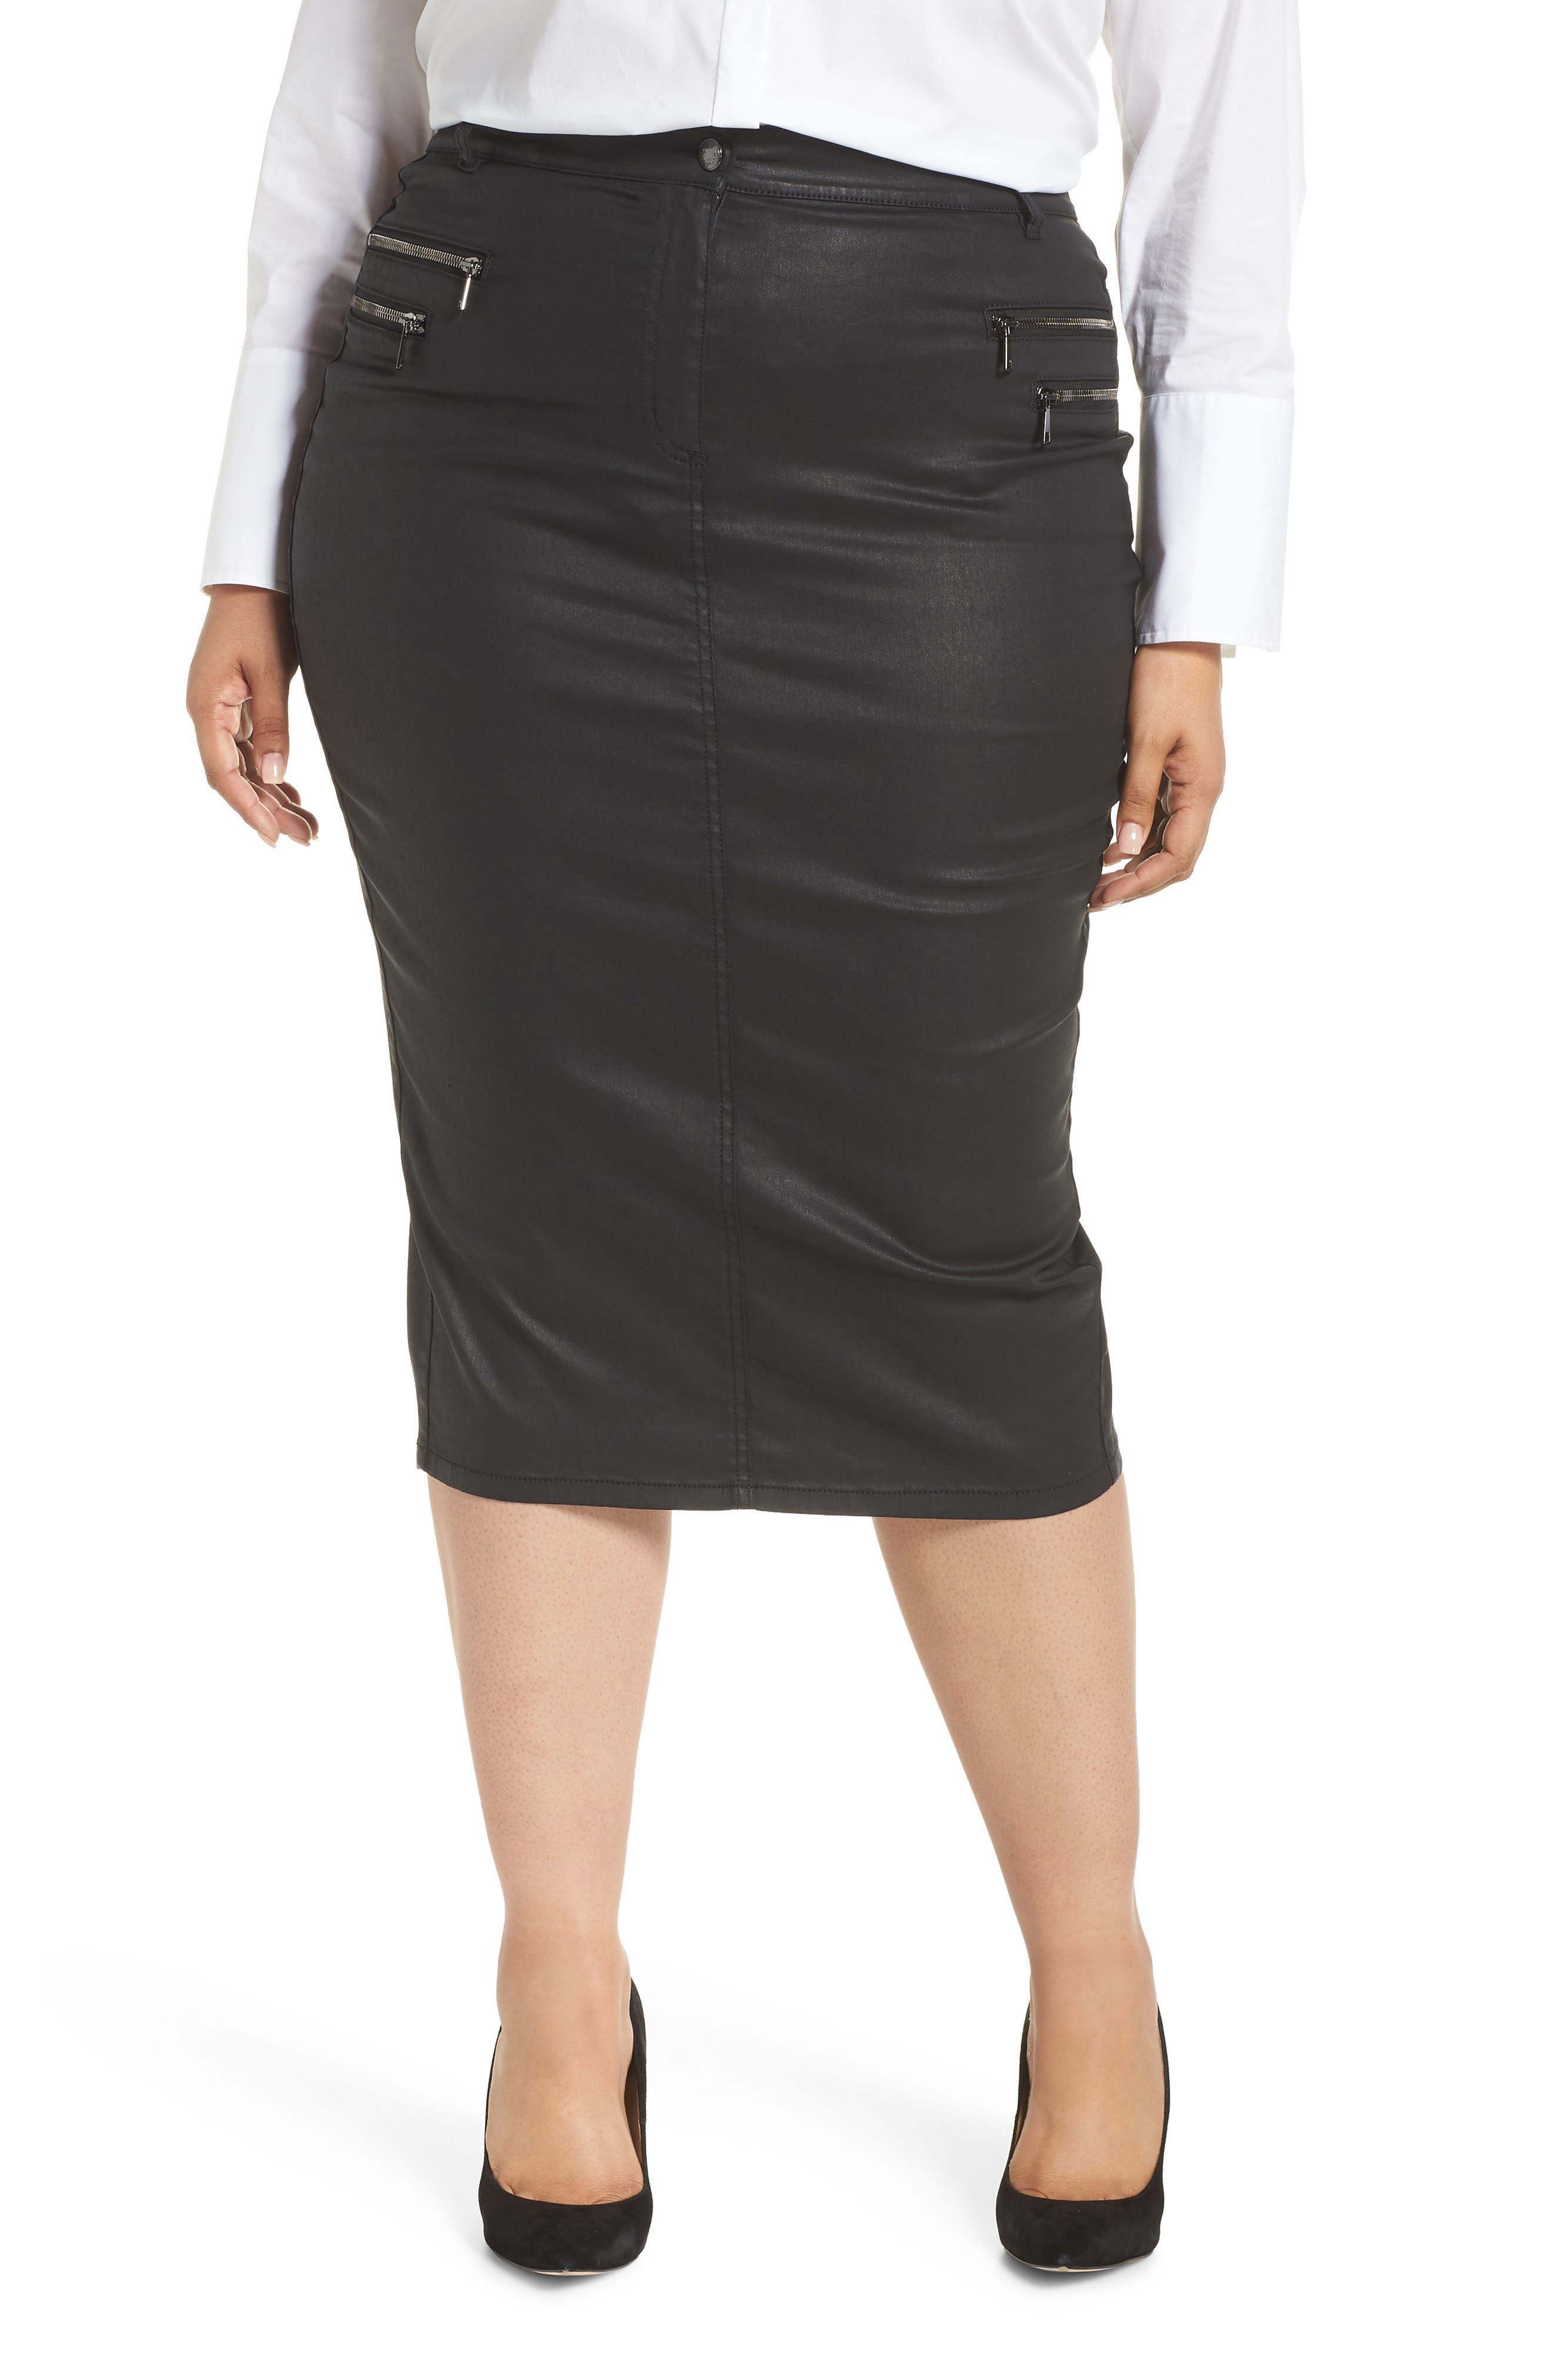 ASHLEY GRAHAM X MARINA RINALDI Capraia Pencil Skirt in Black 2